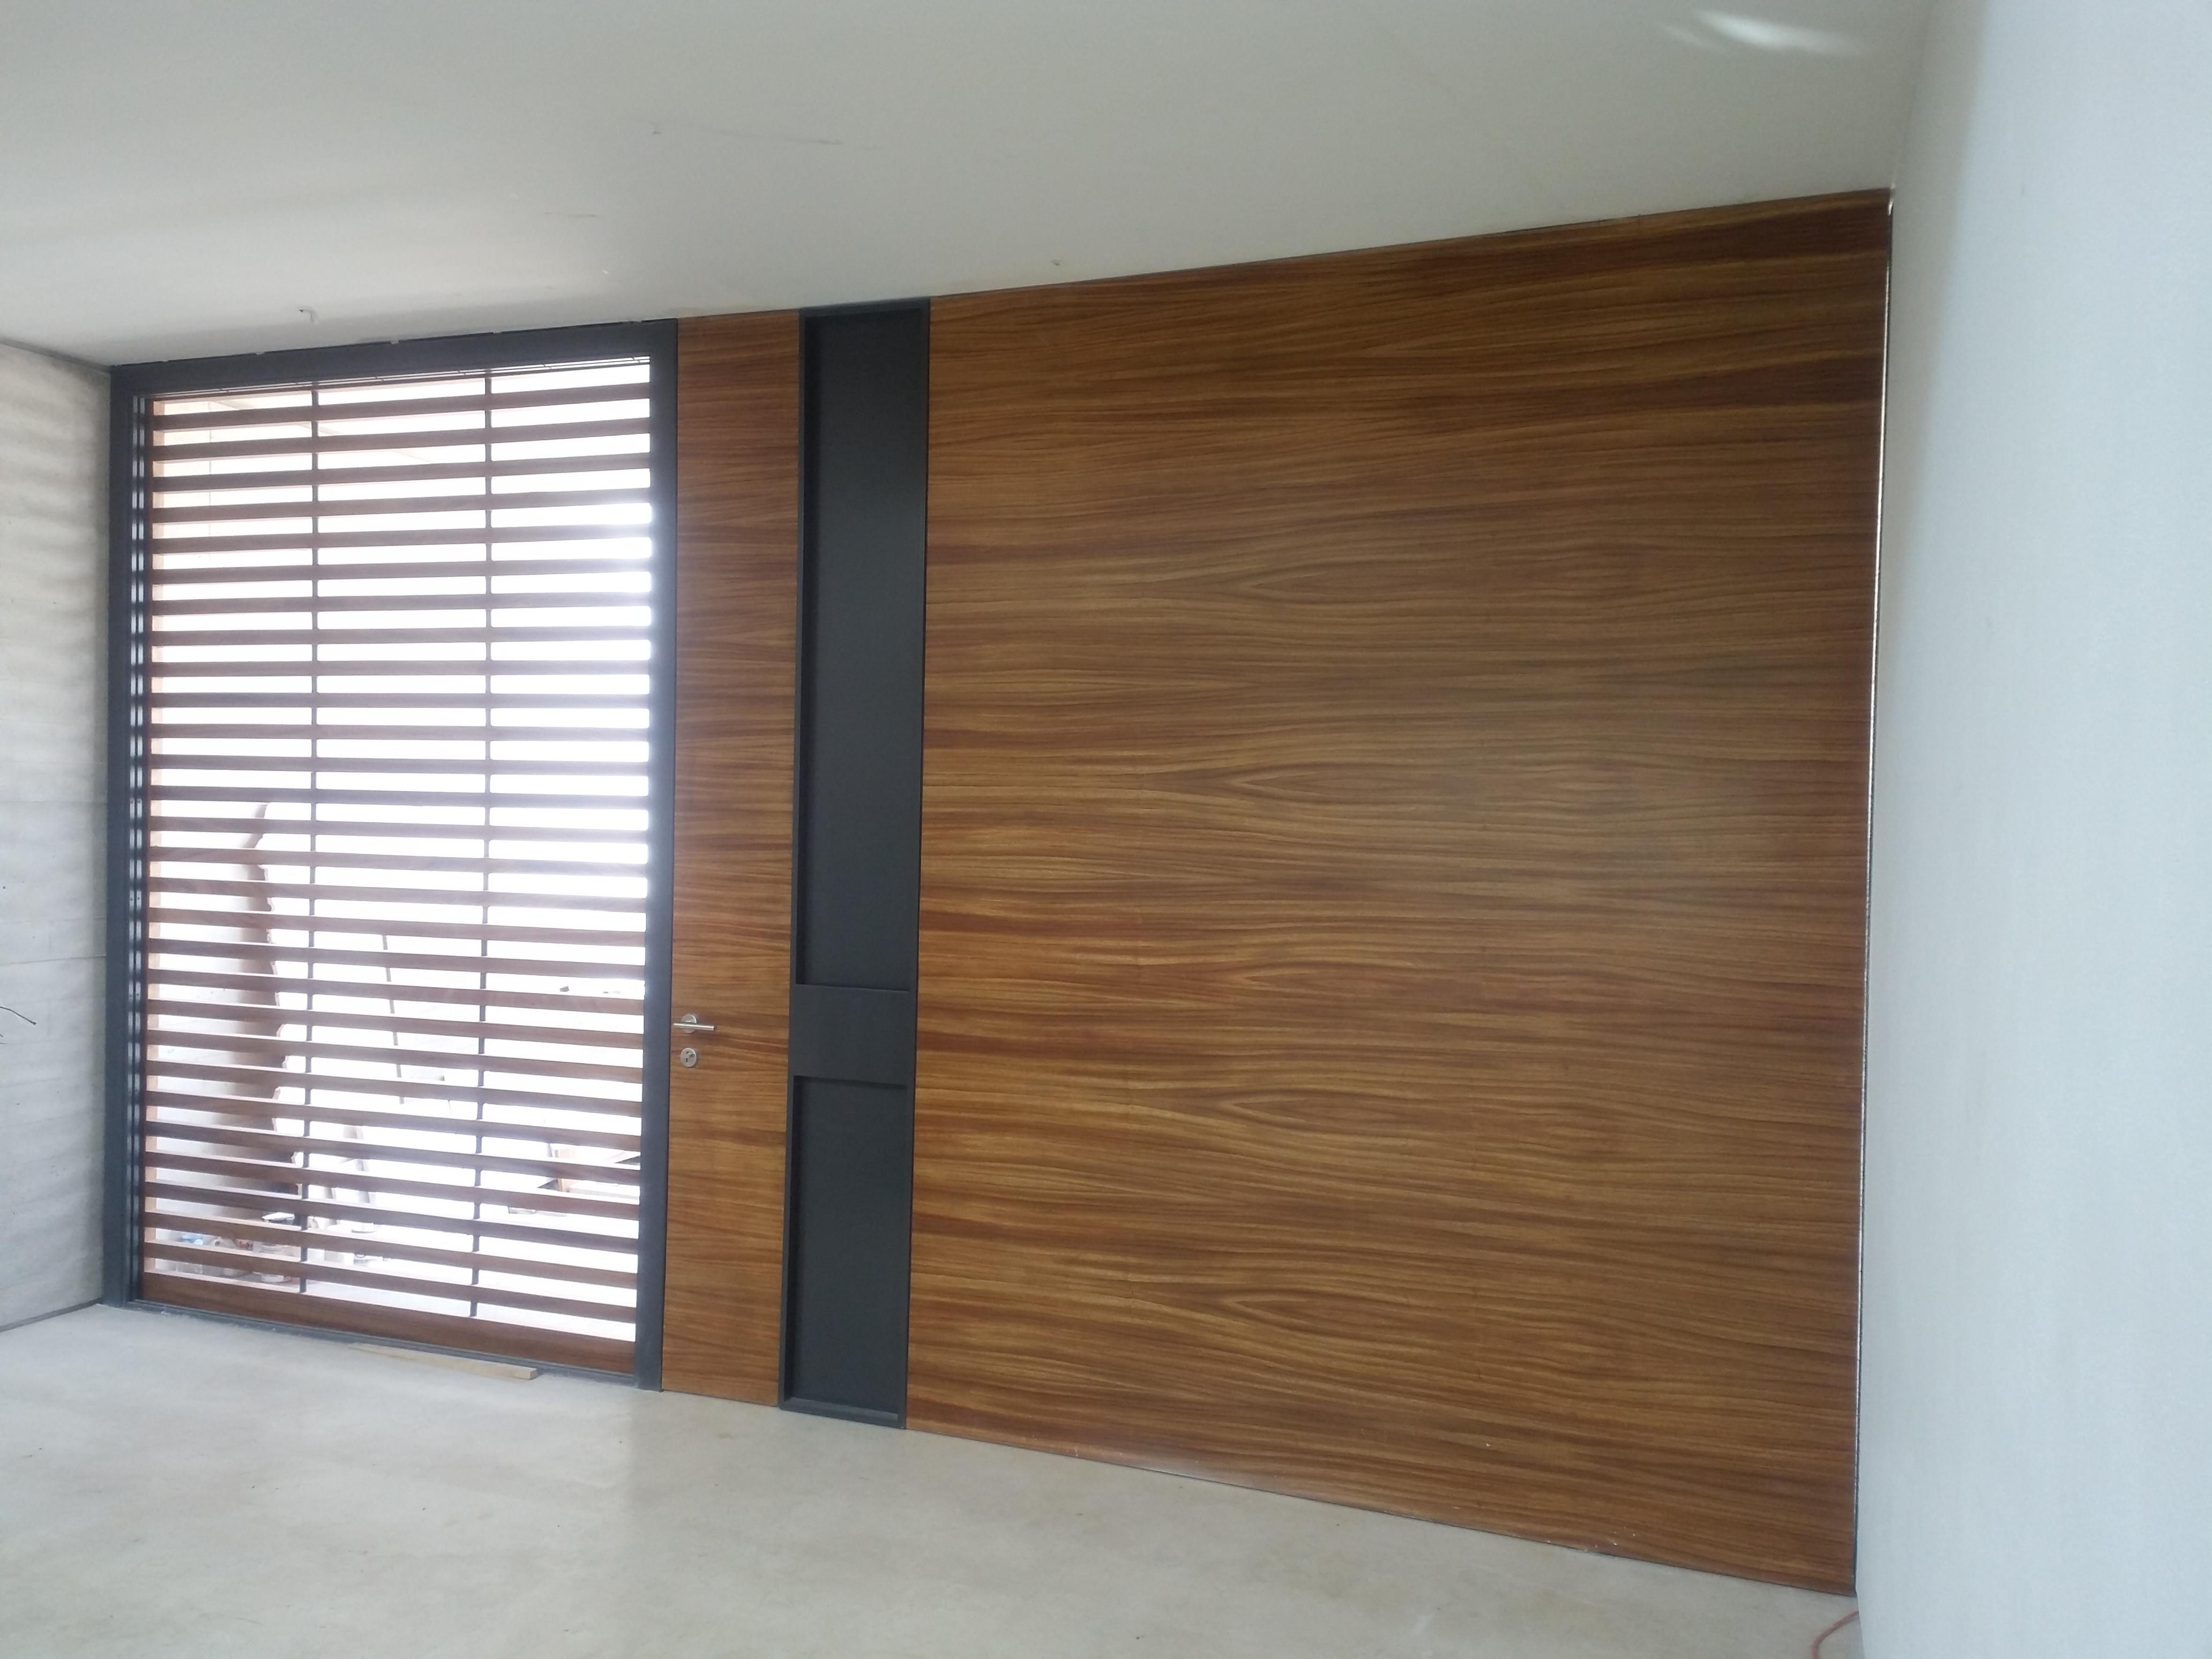 puerta principal de parota